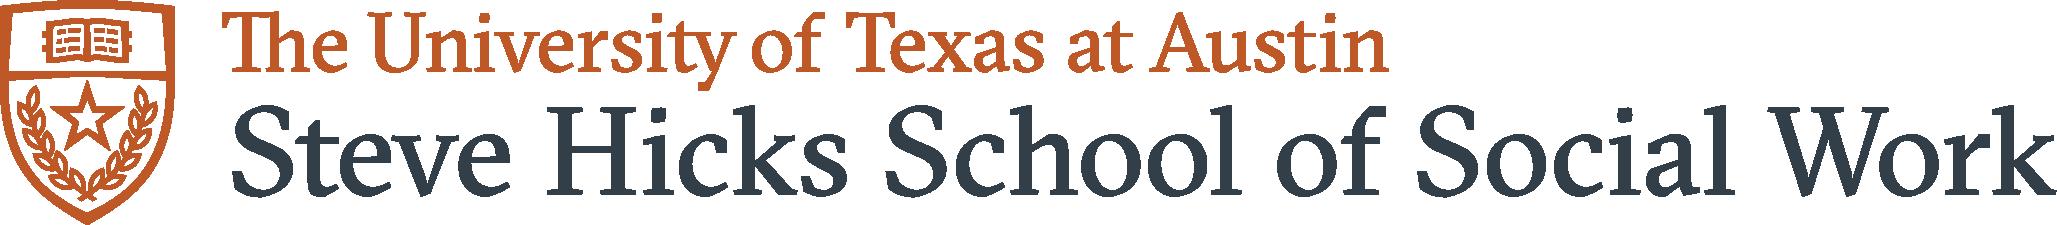 Hicks School of Social Work